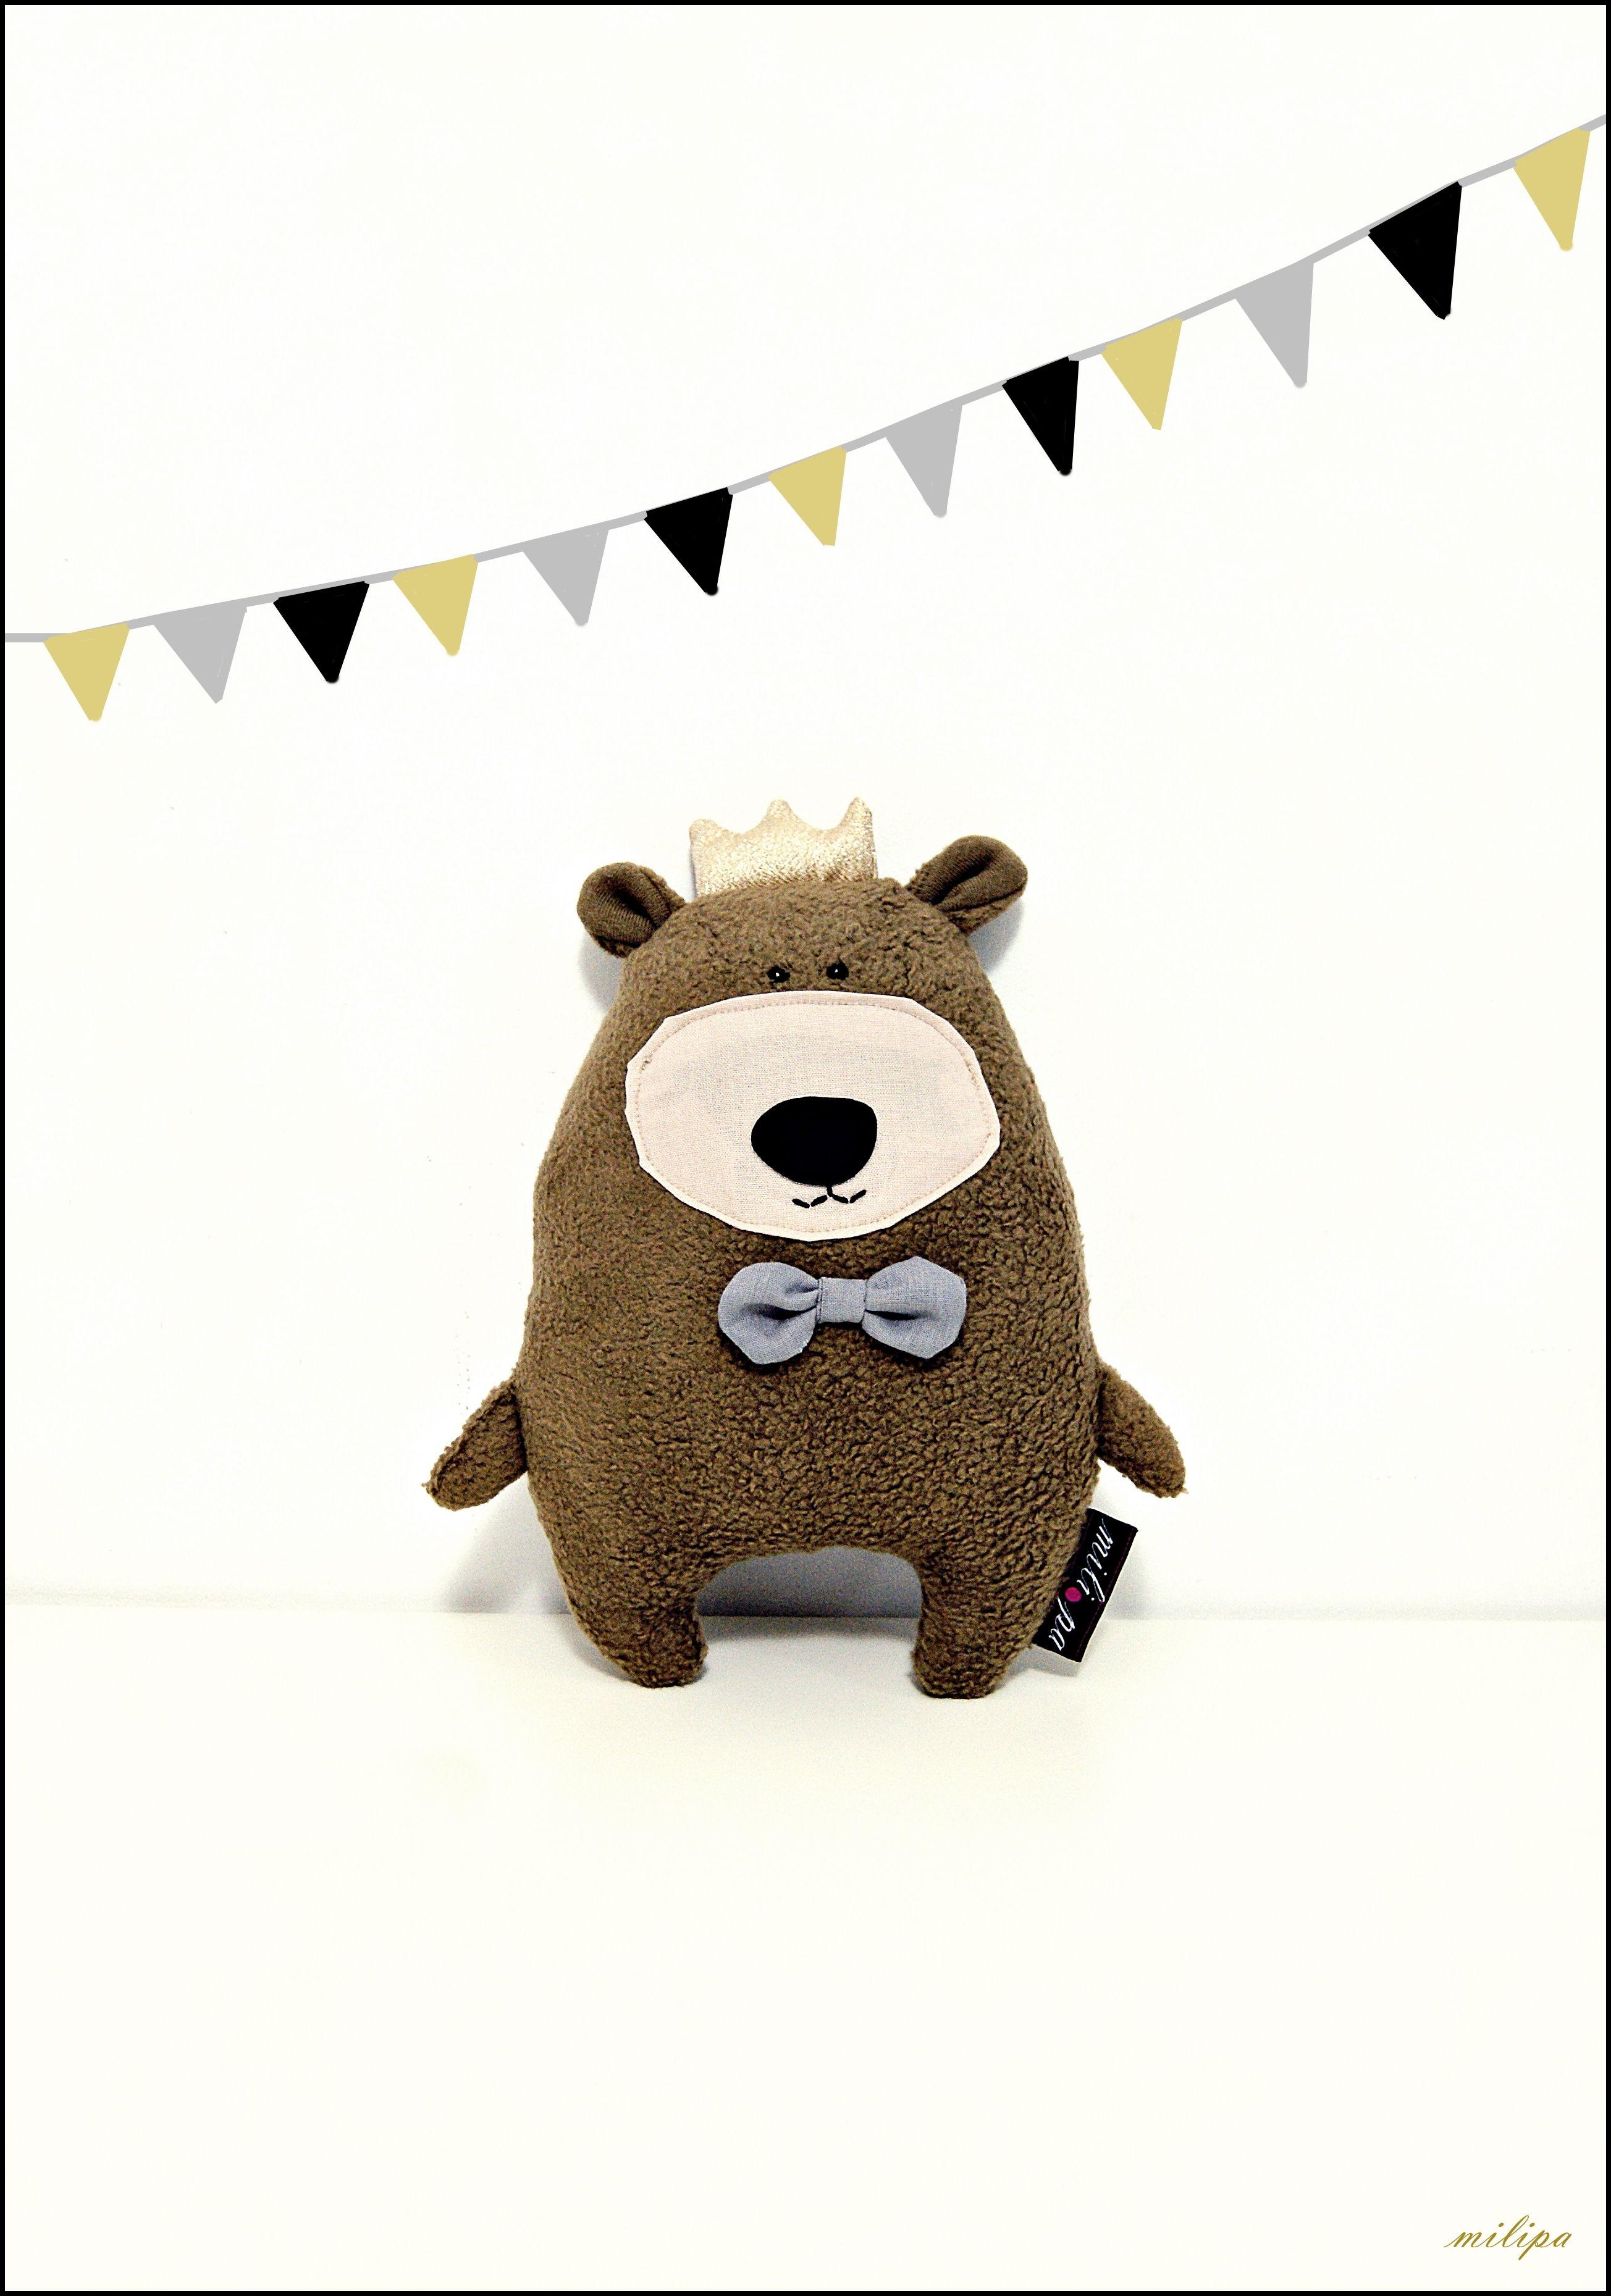 Pin de Beatriz Lopez en juguetes | Pinterest | Osos, Trapillo y Muñecas